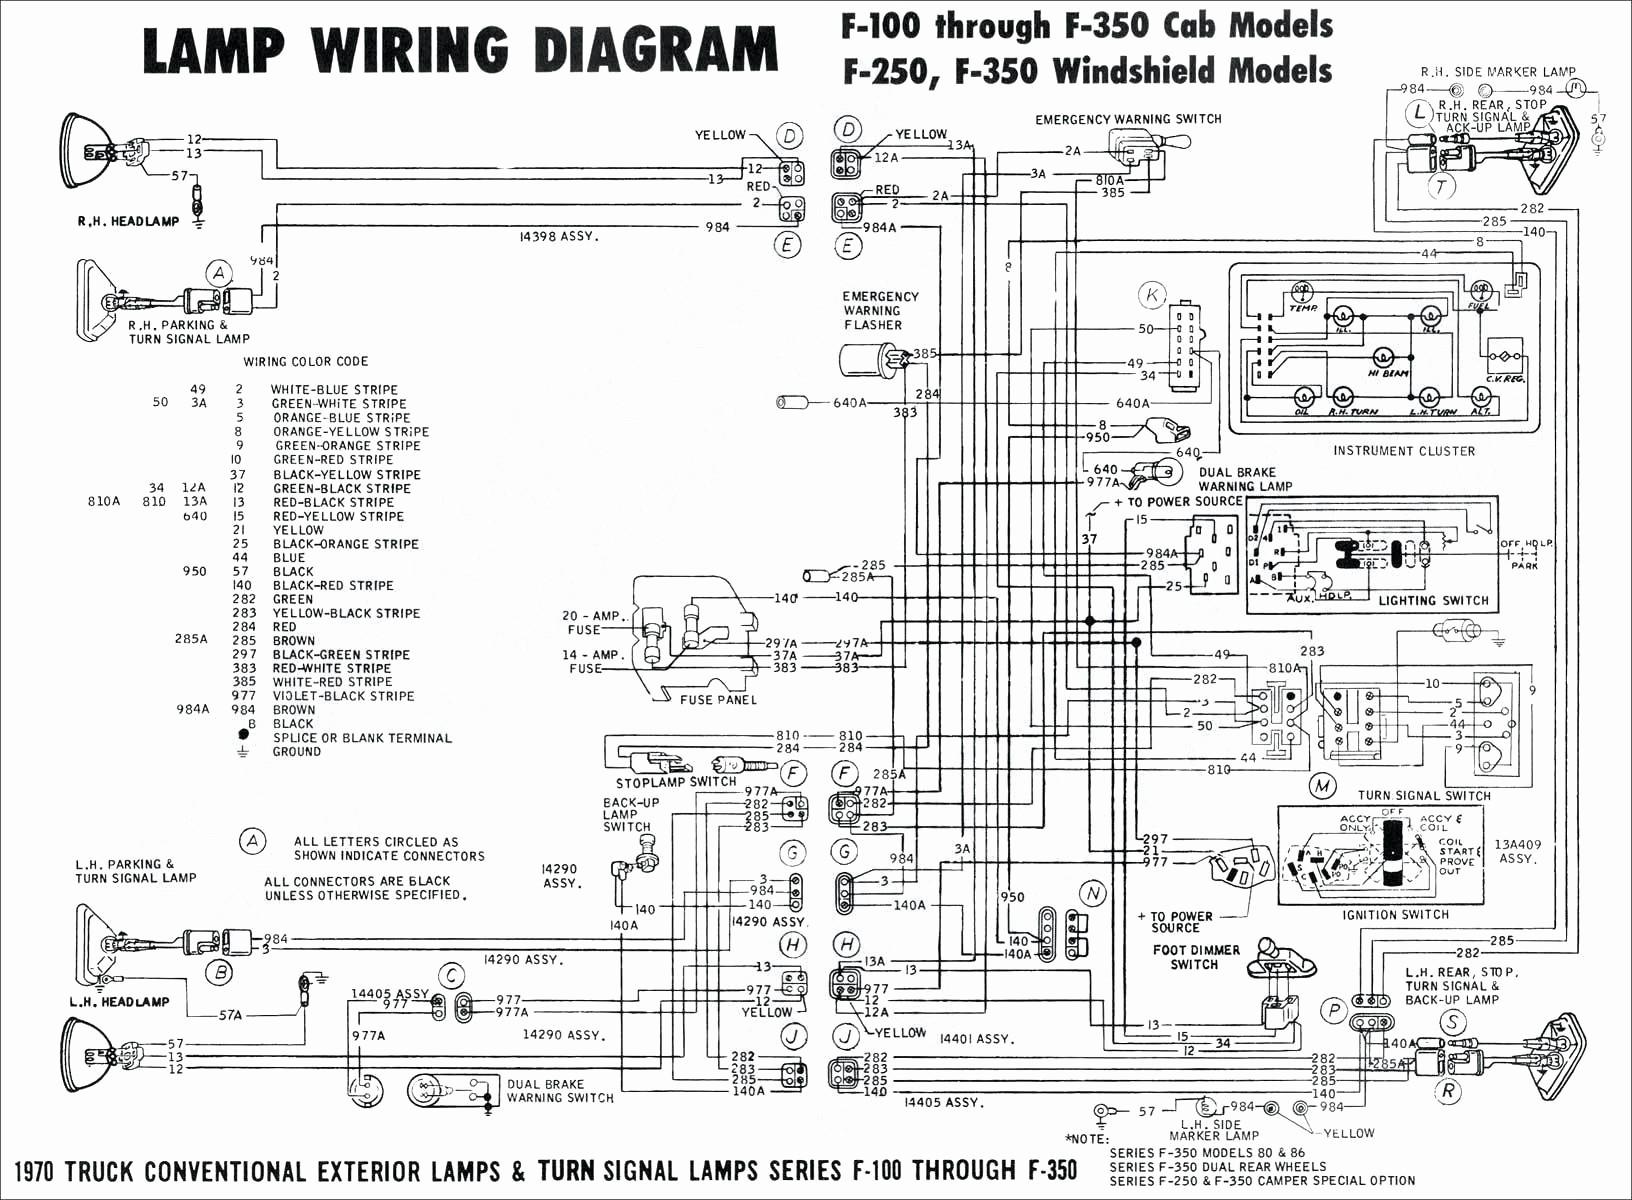 2008 toyota Highlander Engine Diagram 2004 Cadillac Escalade Trailer Wiring Worksheet and Wiring Diagram • Of 2008 toyota Highlander Engine Diagram